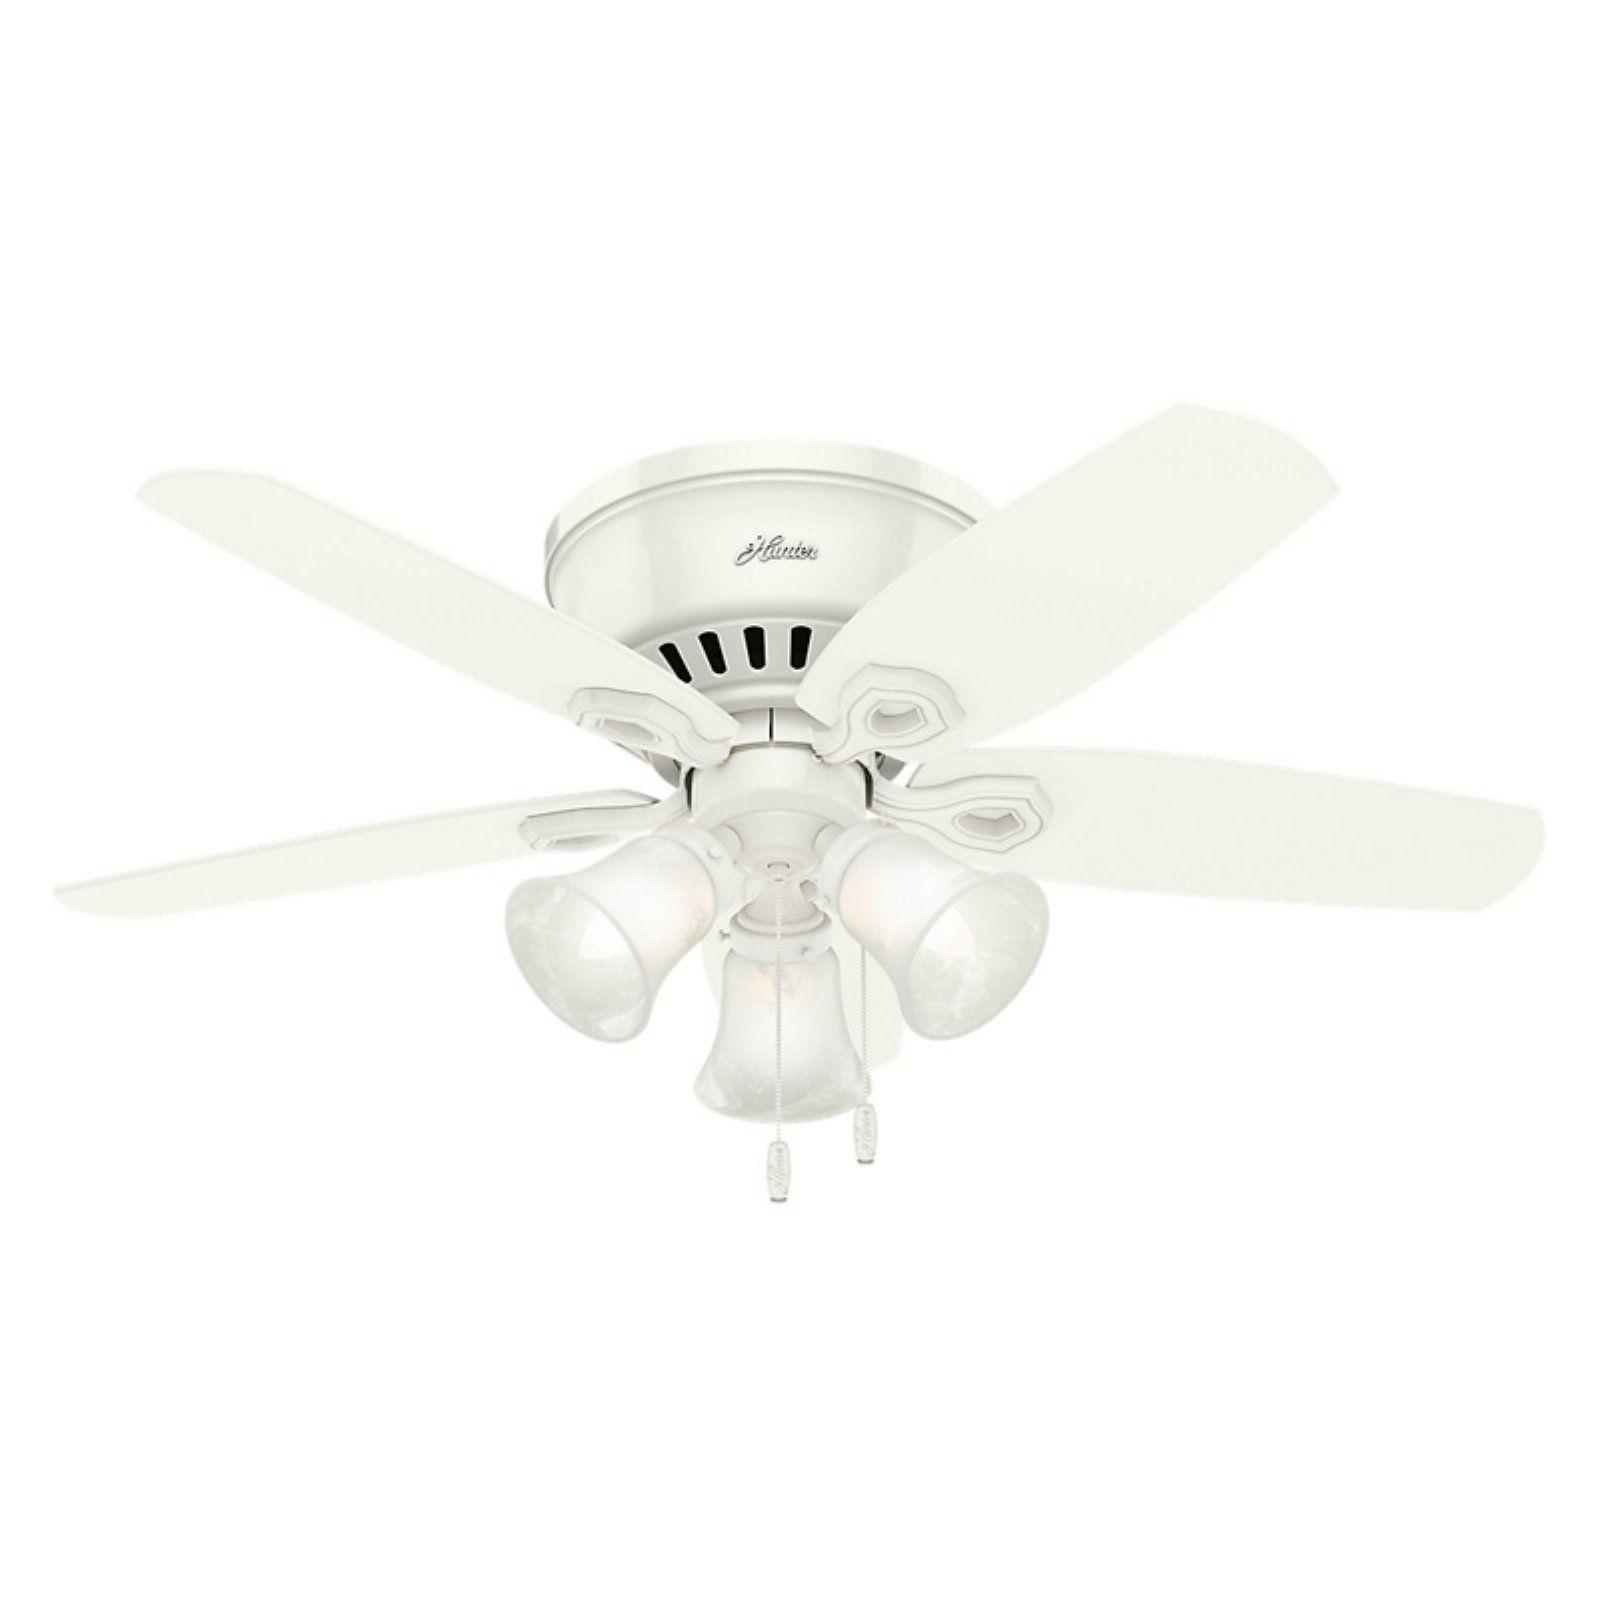 Hunter Builder Low Profile 5109 42 In Indoor Ceiling Fan Ceiling Fan With Light Ceiling Fan Flush Mount Ceiling Fan